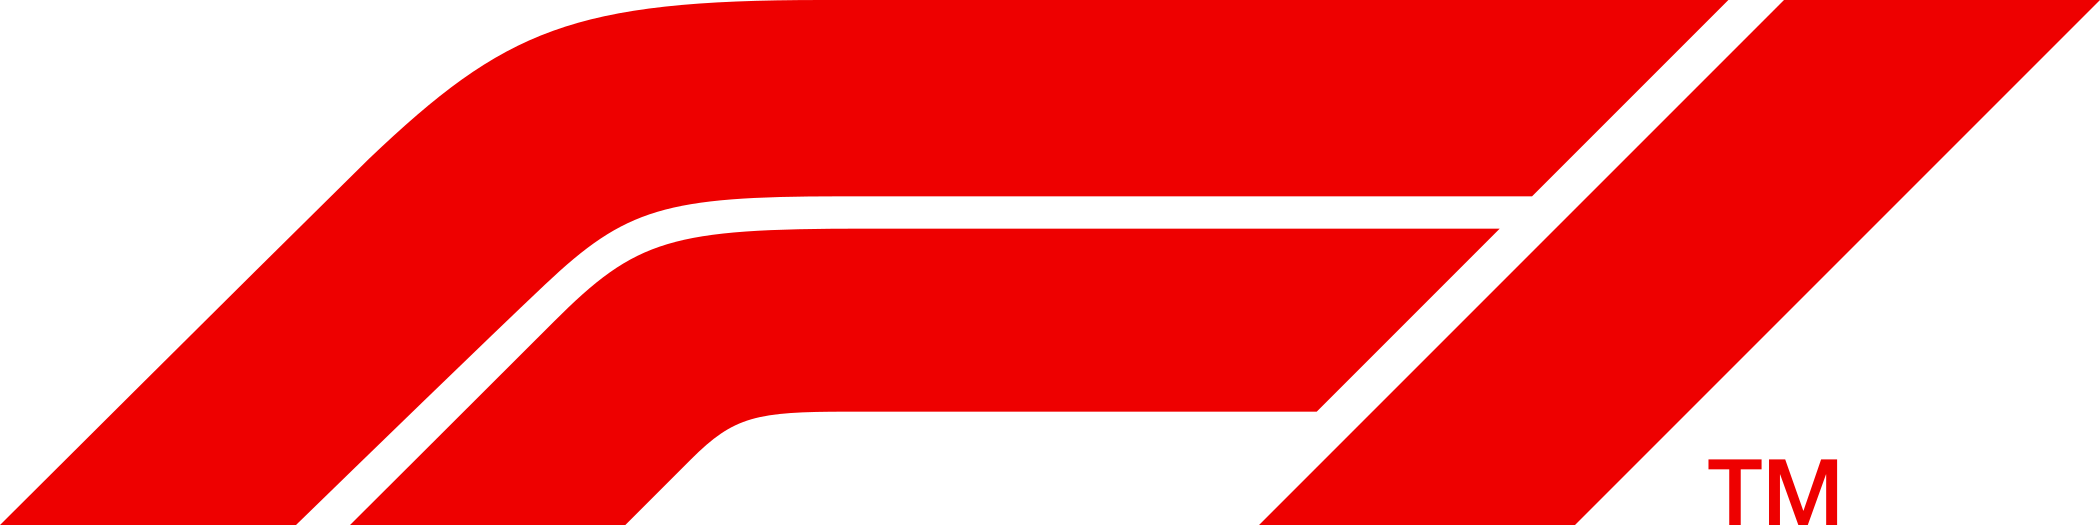 formula 1 logo 1 1 - Formula 1 Logo - F1 Logo